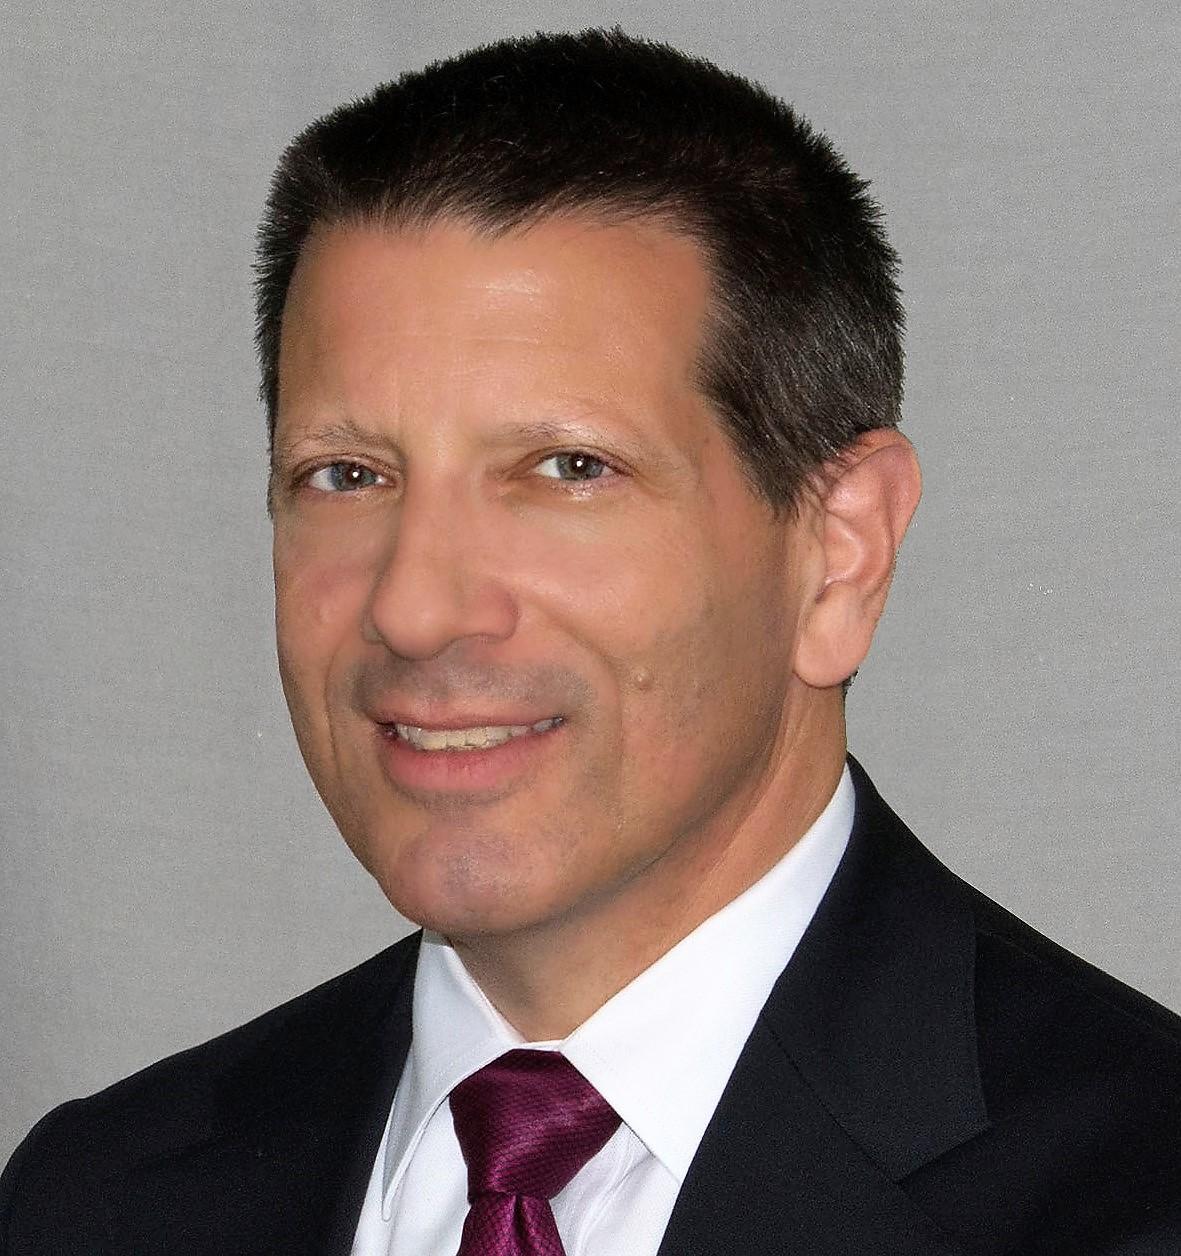 Robert Isackson, Partner